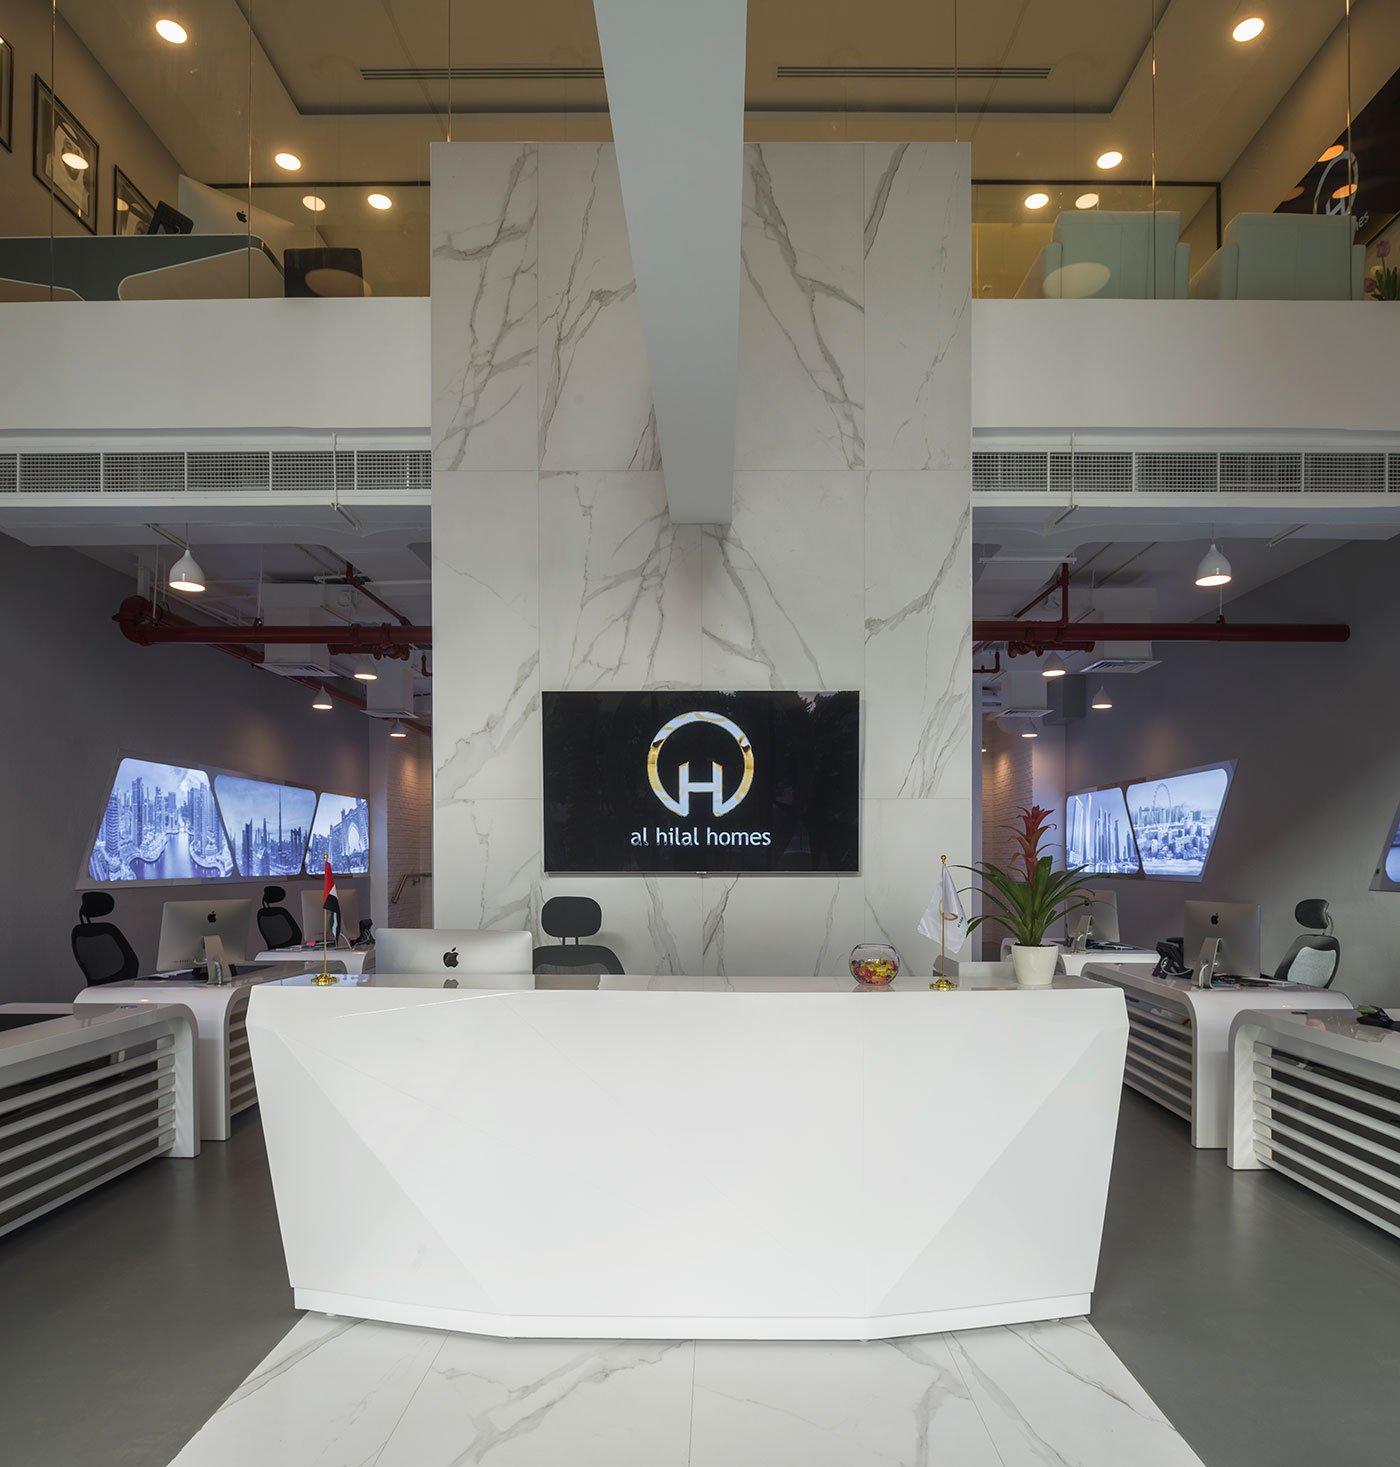 reception desk of an office